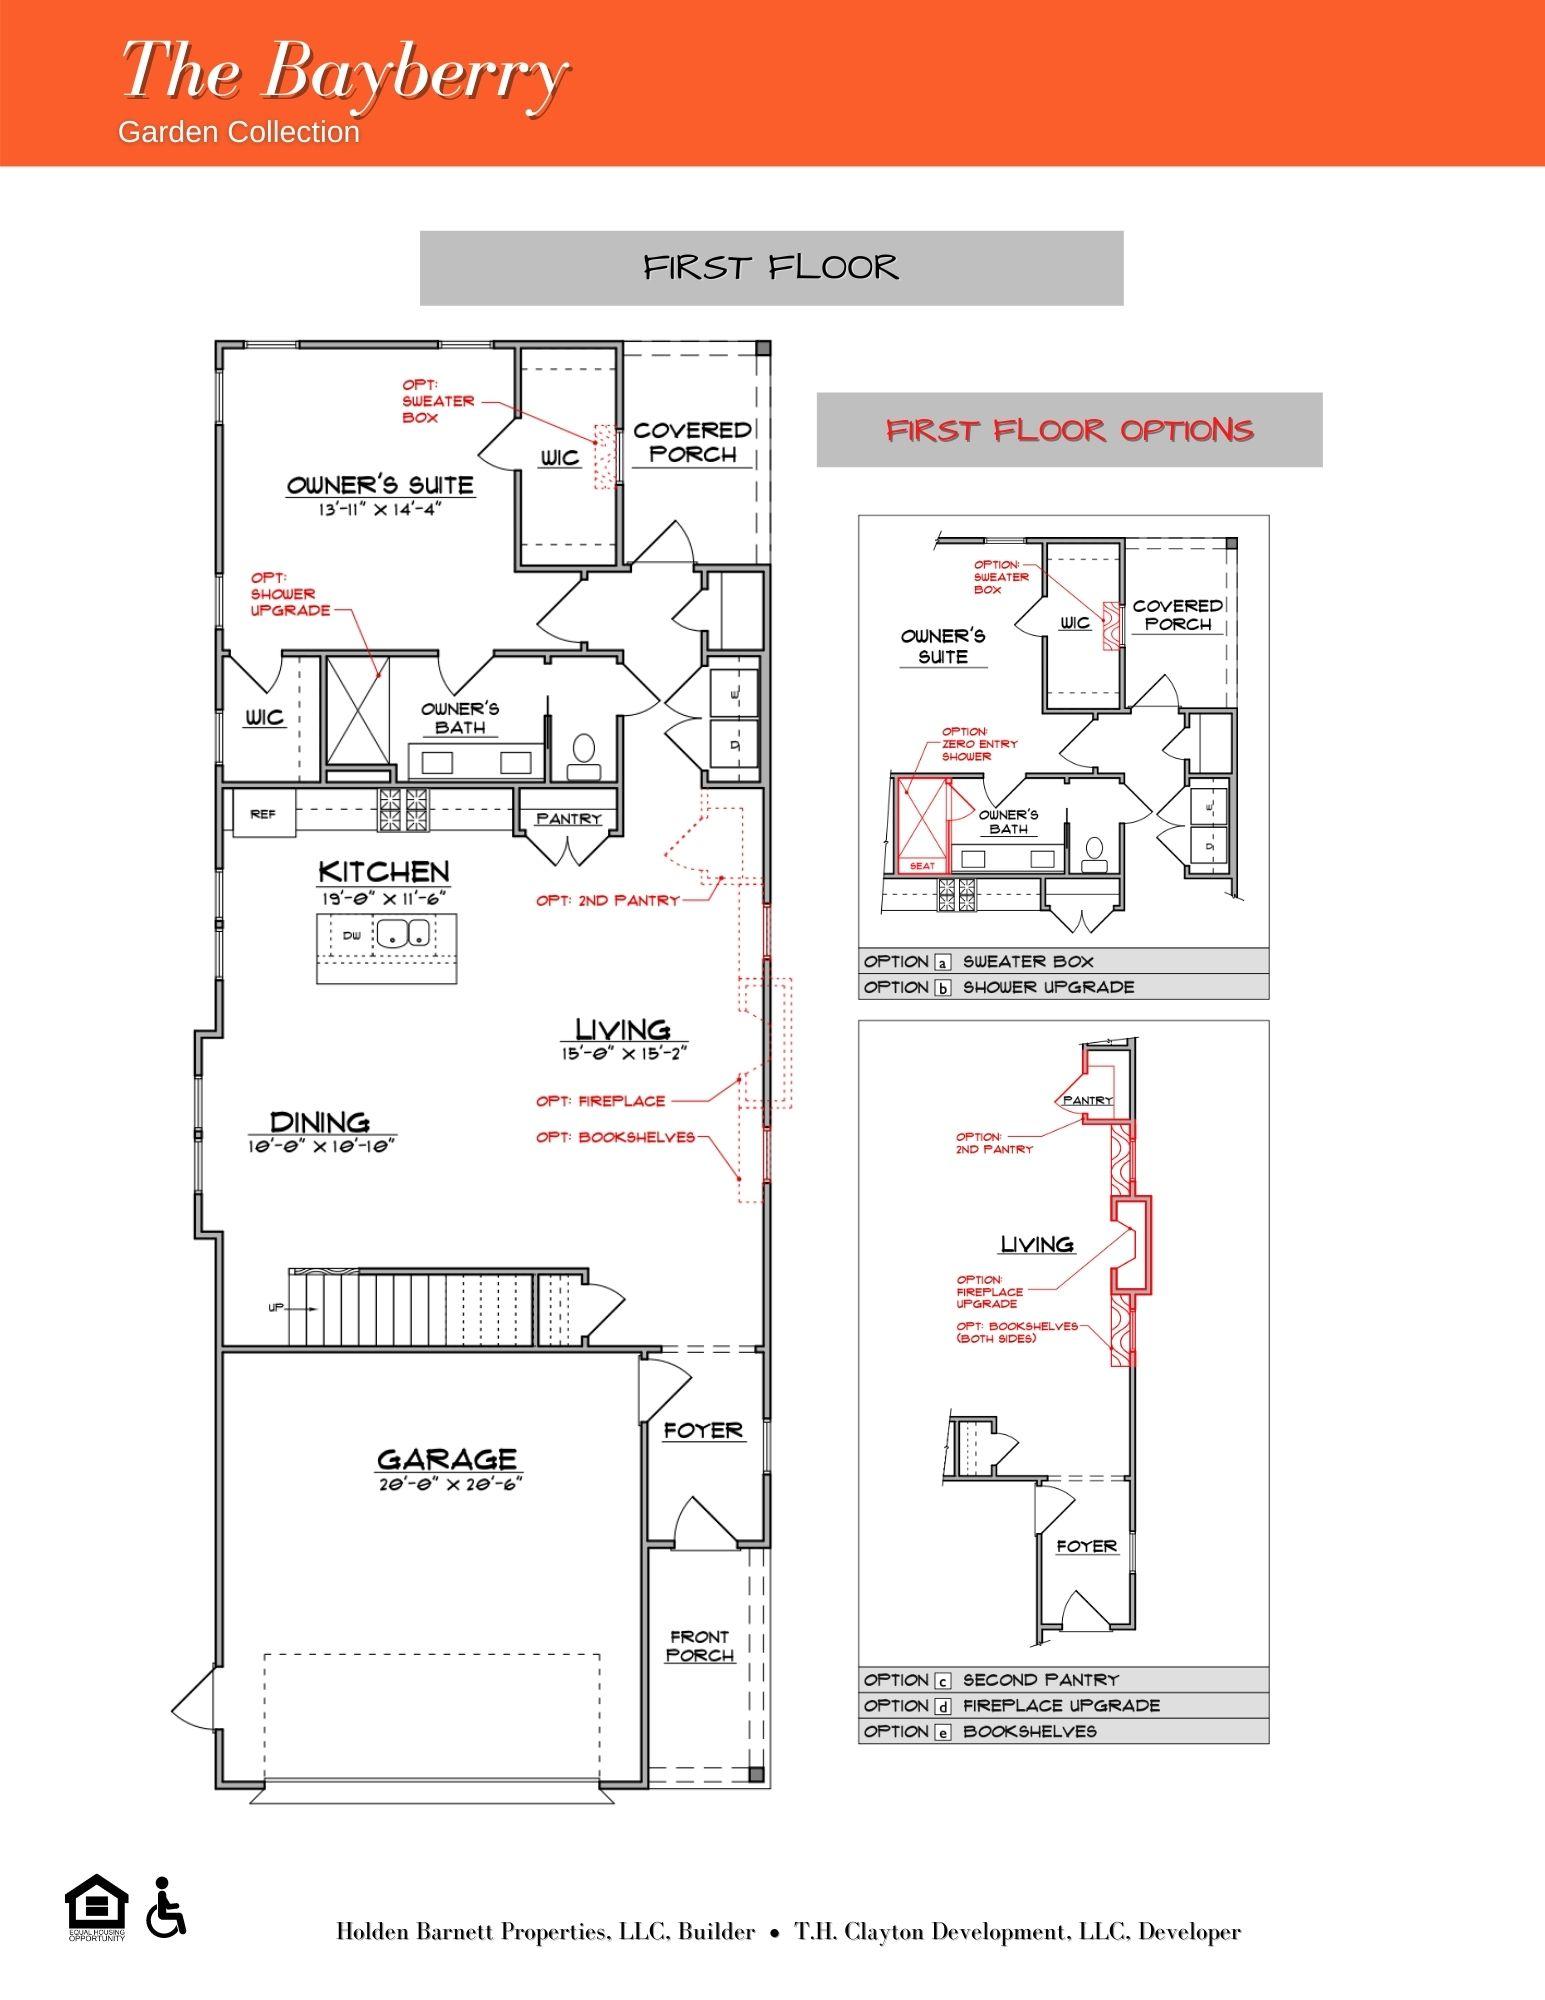 The Bayberry First Floor Floorplan